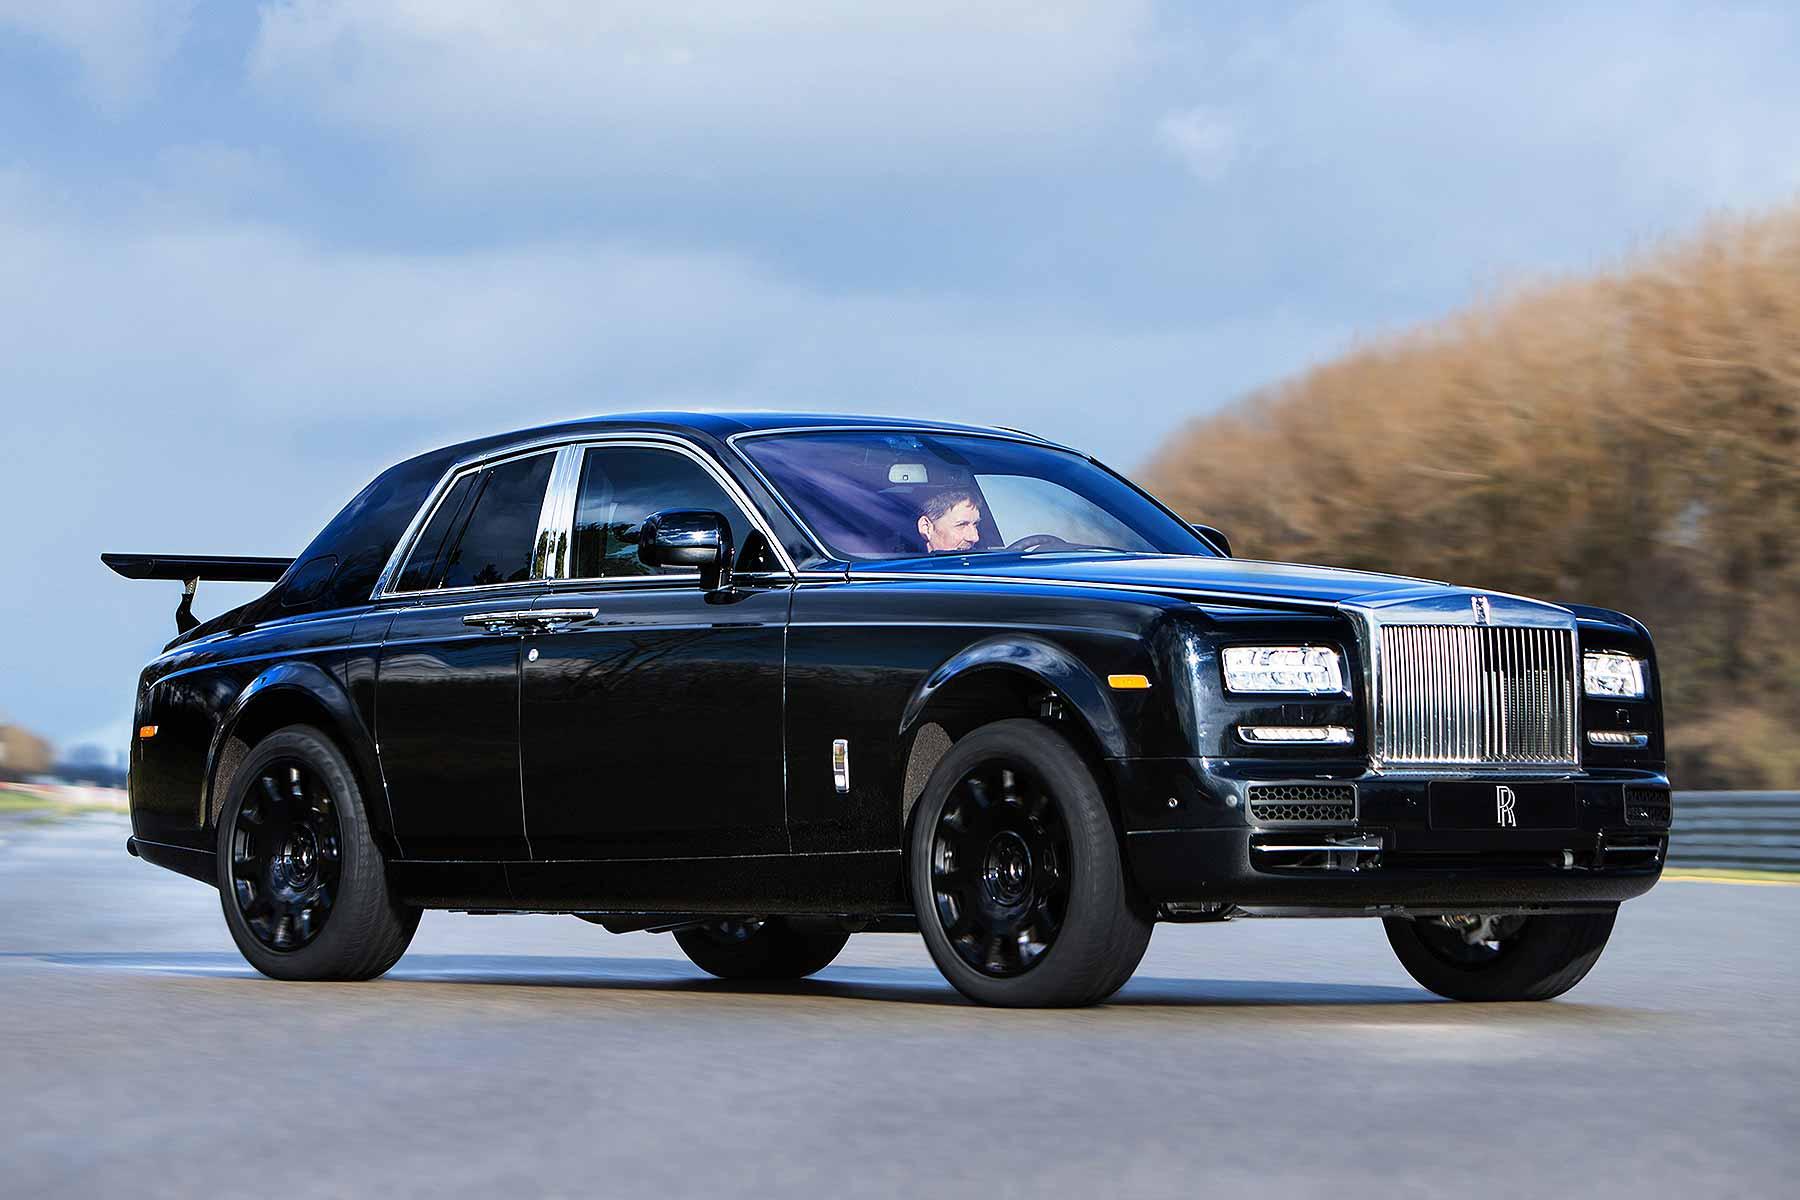 Rolls-Royce Project Cullinan SUV